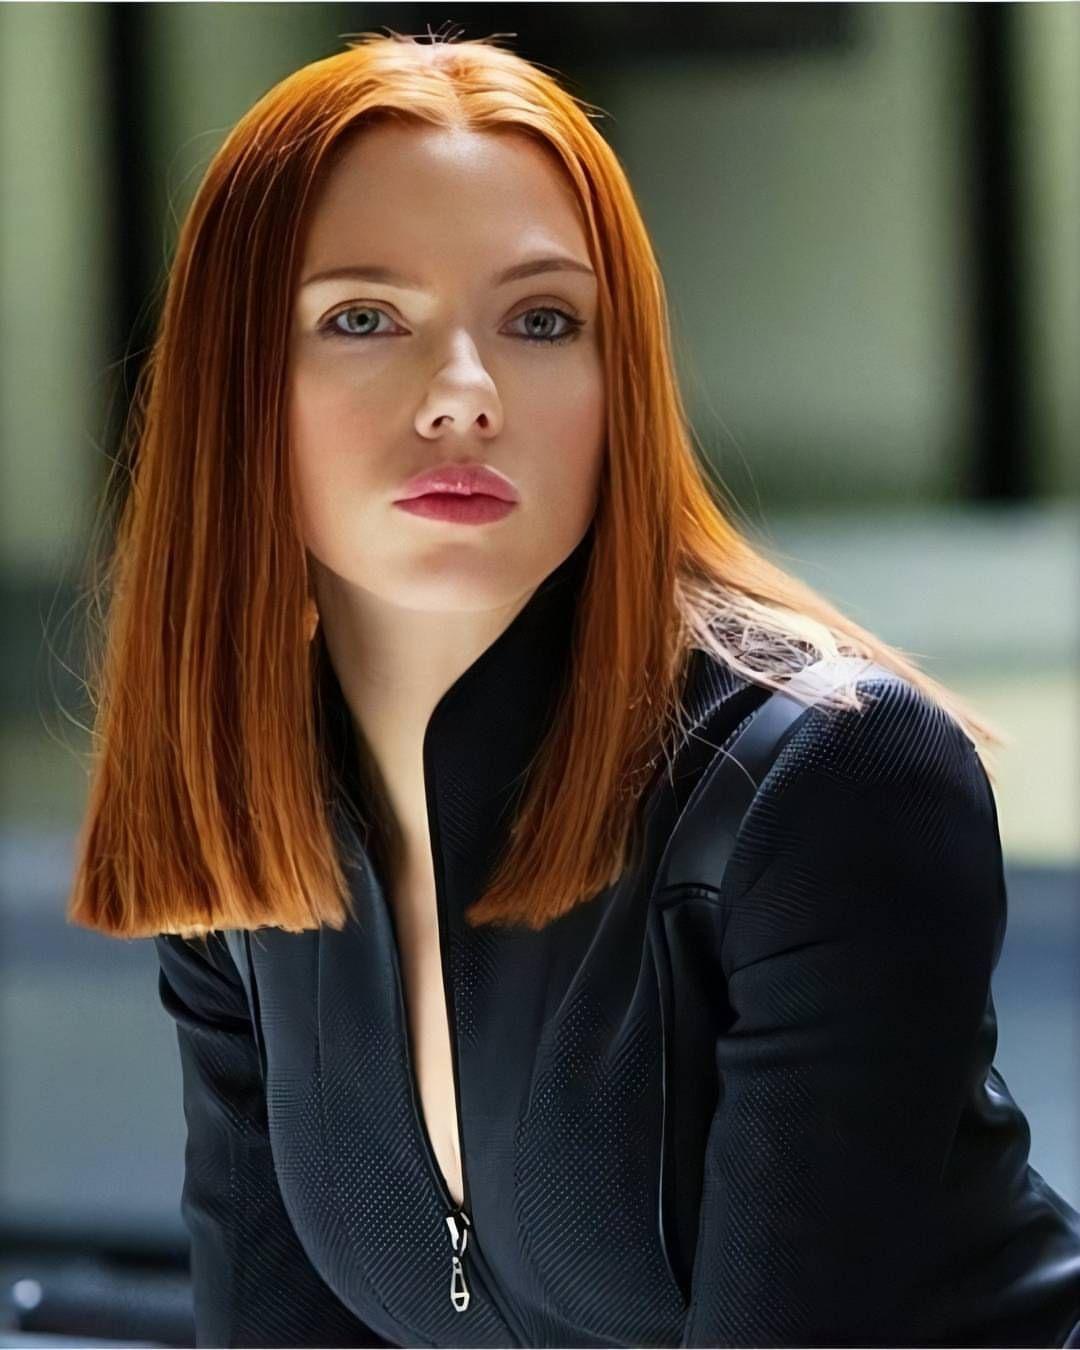 Pin on Scarlett Johansson / Black Widow